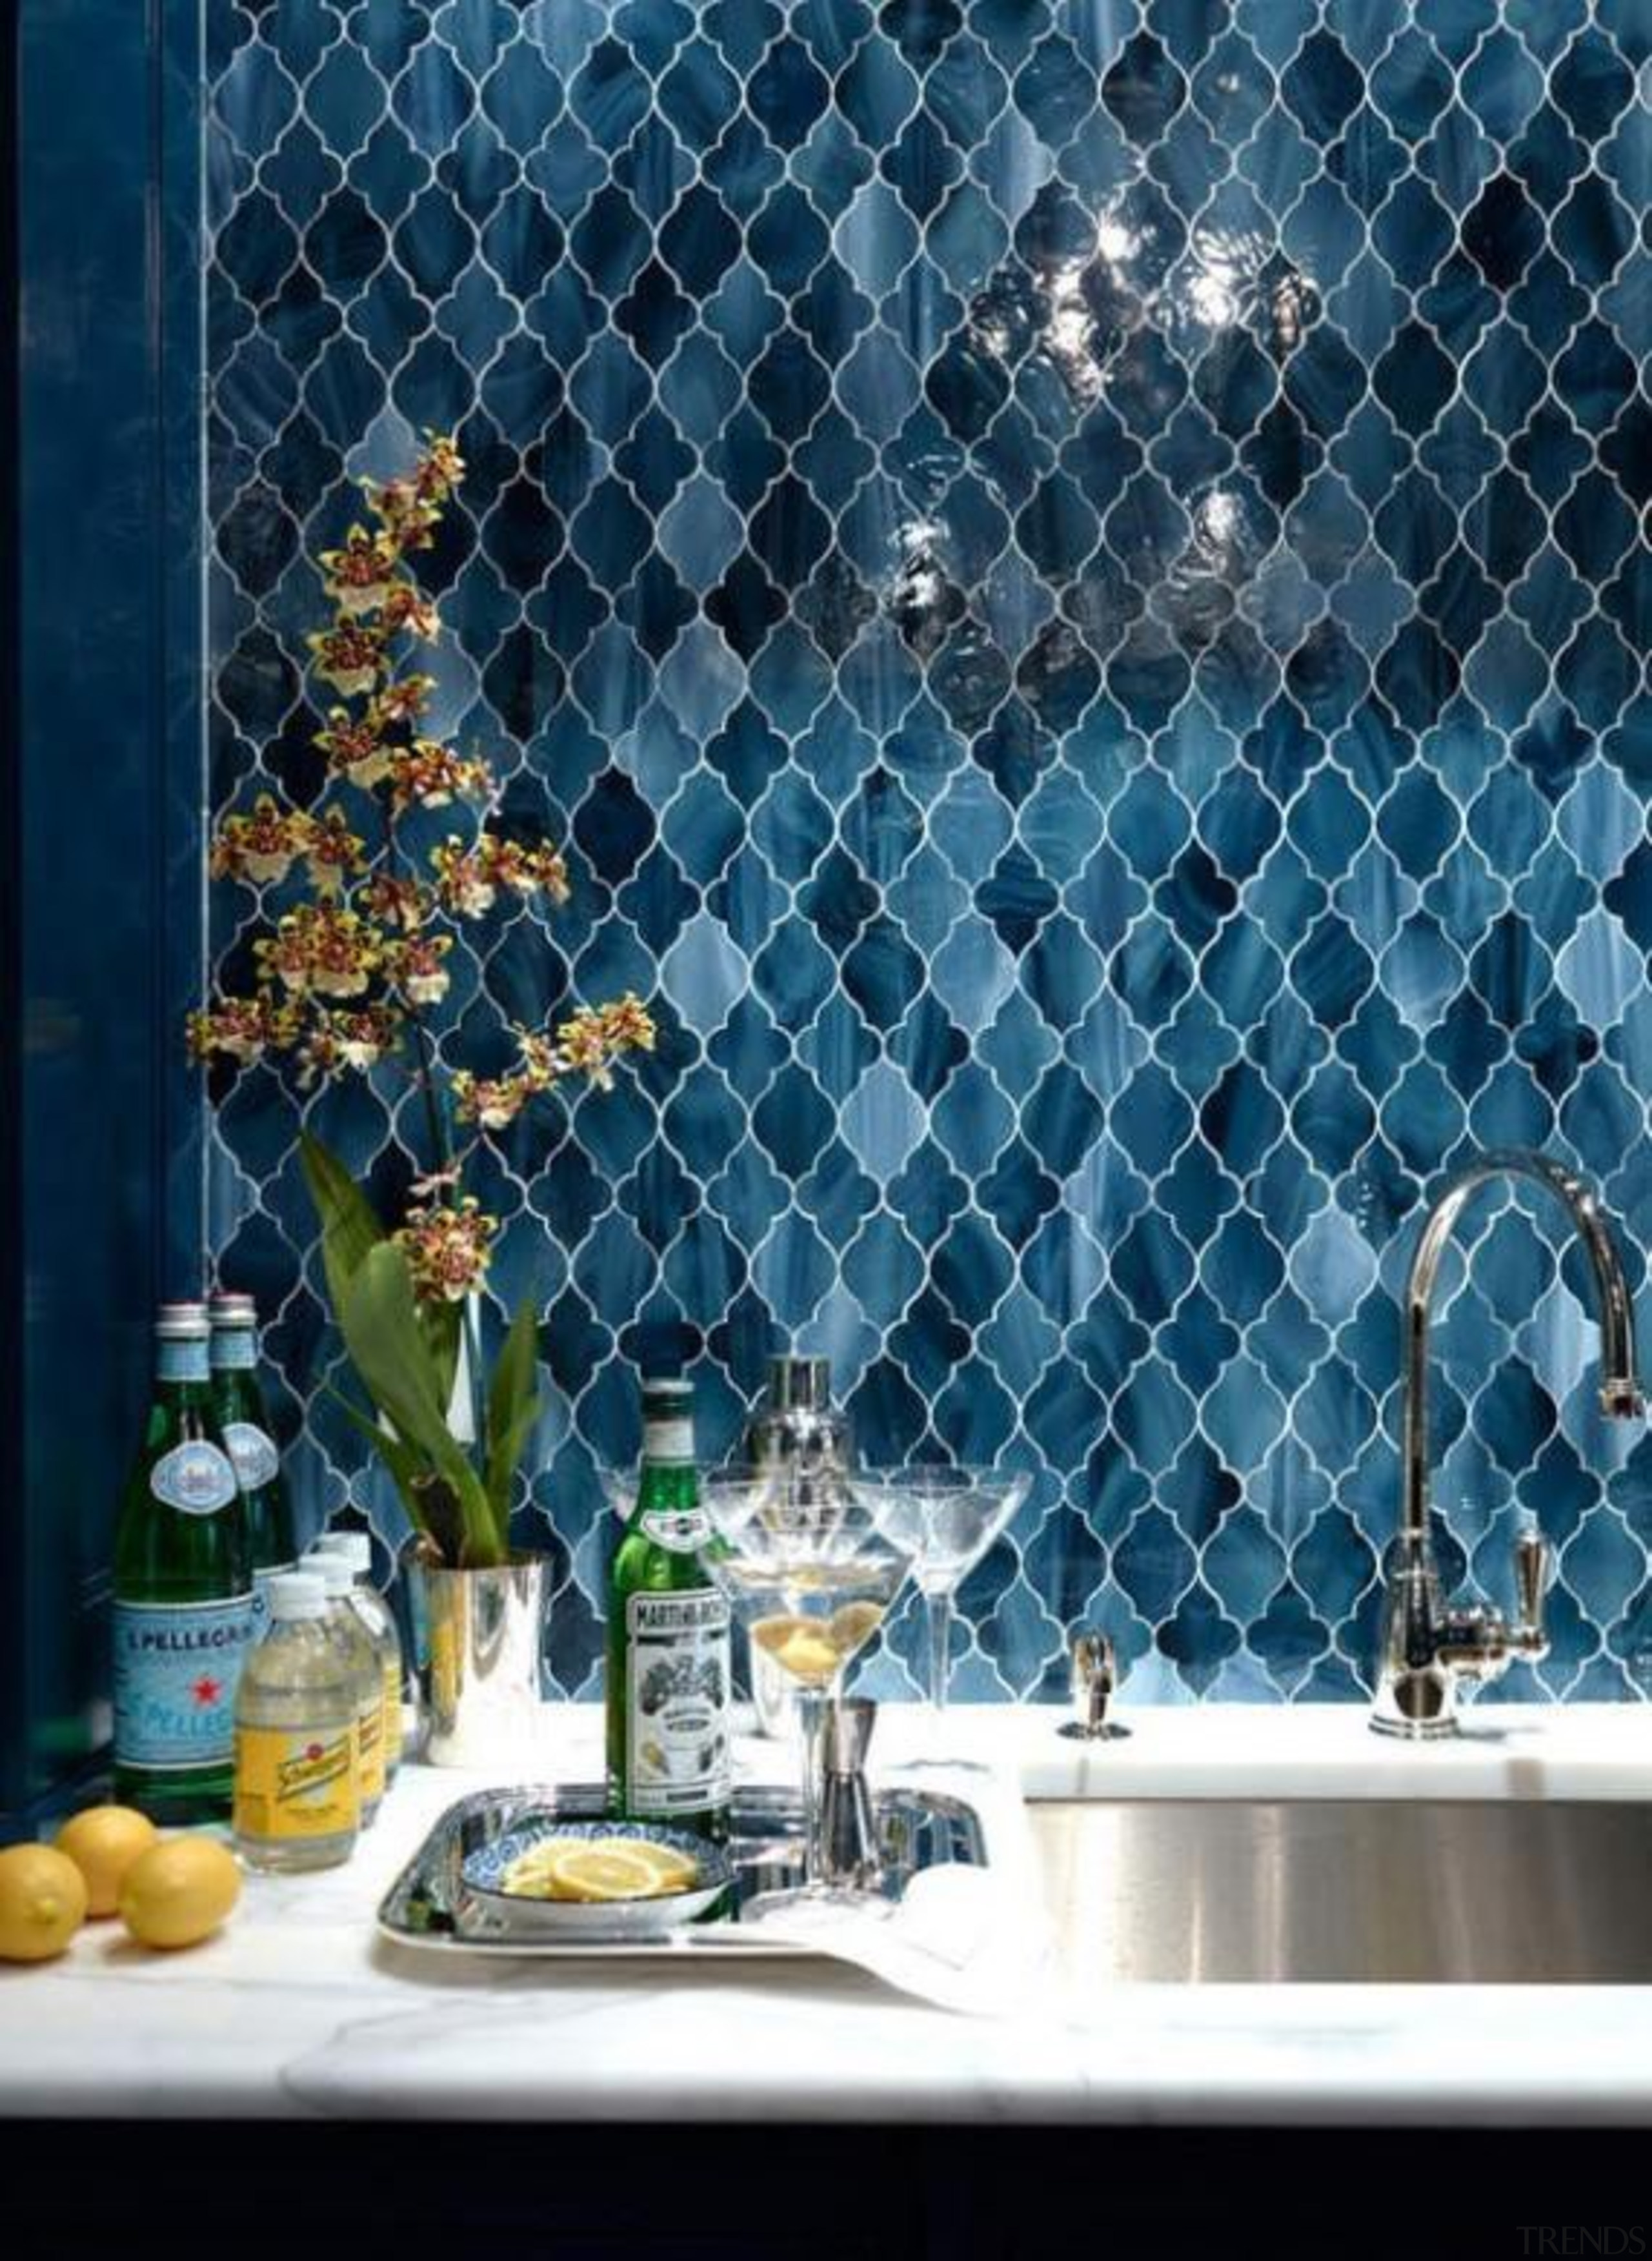 Cerulean blue backsplash - Cerulean blue - backsplash blue, glass, interior design, wall, blue, teal